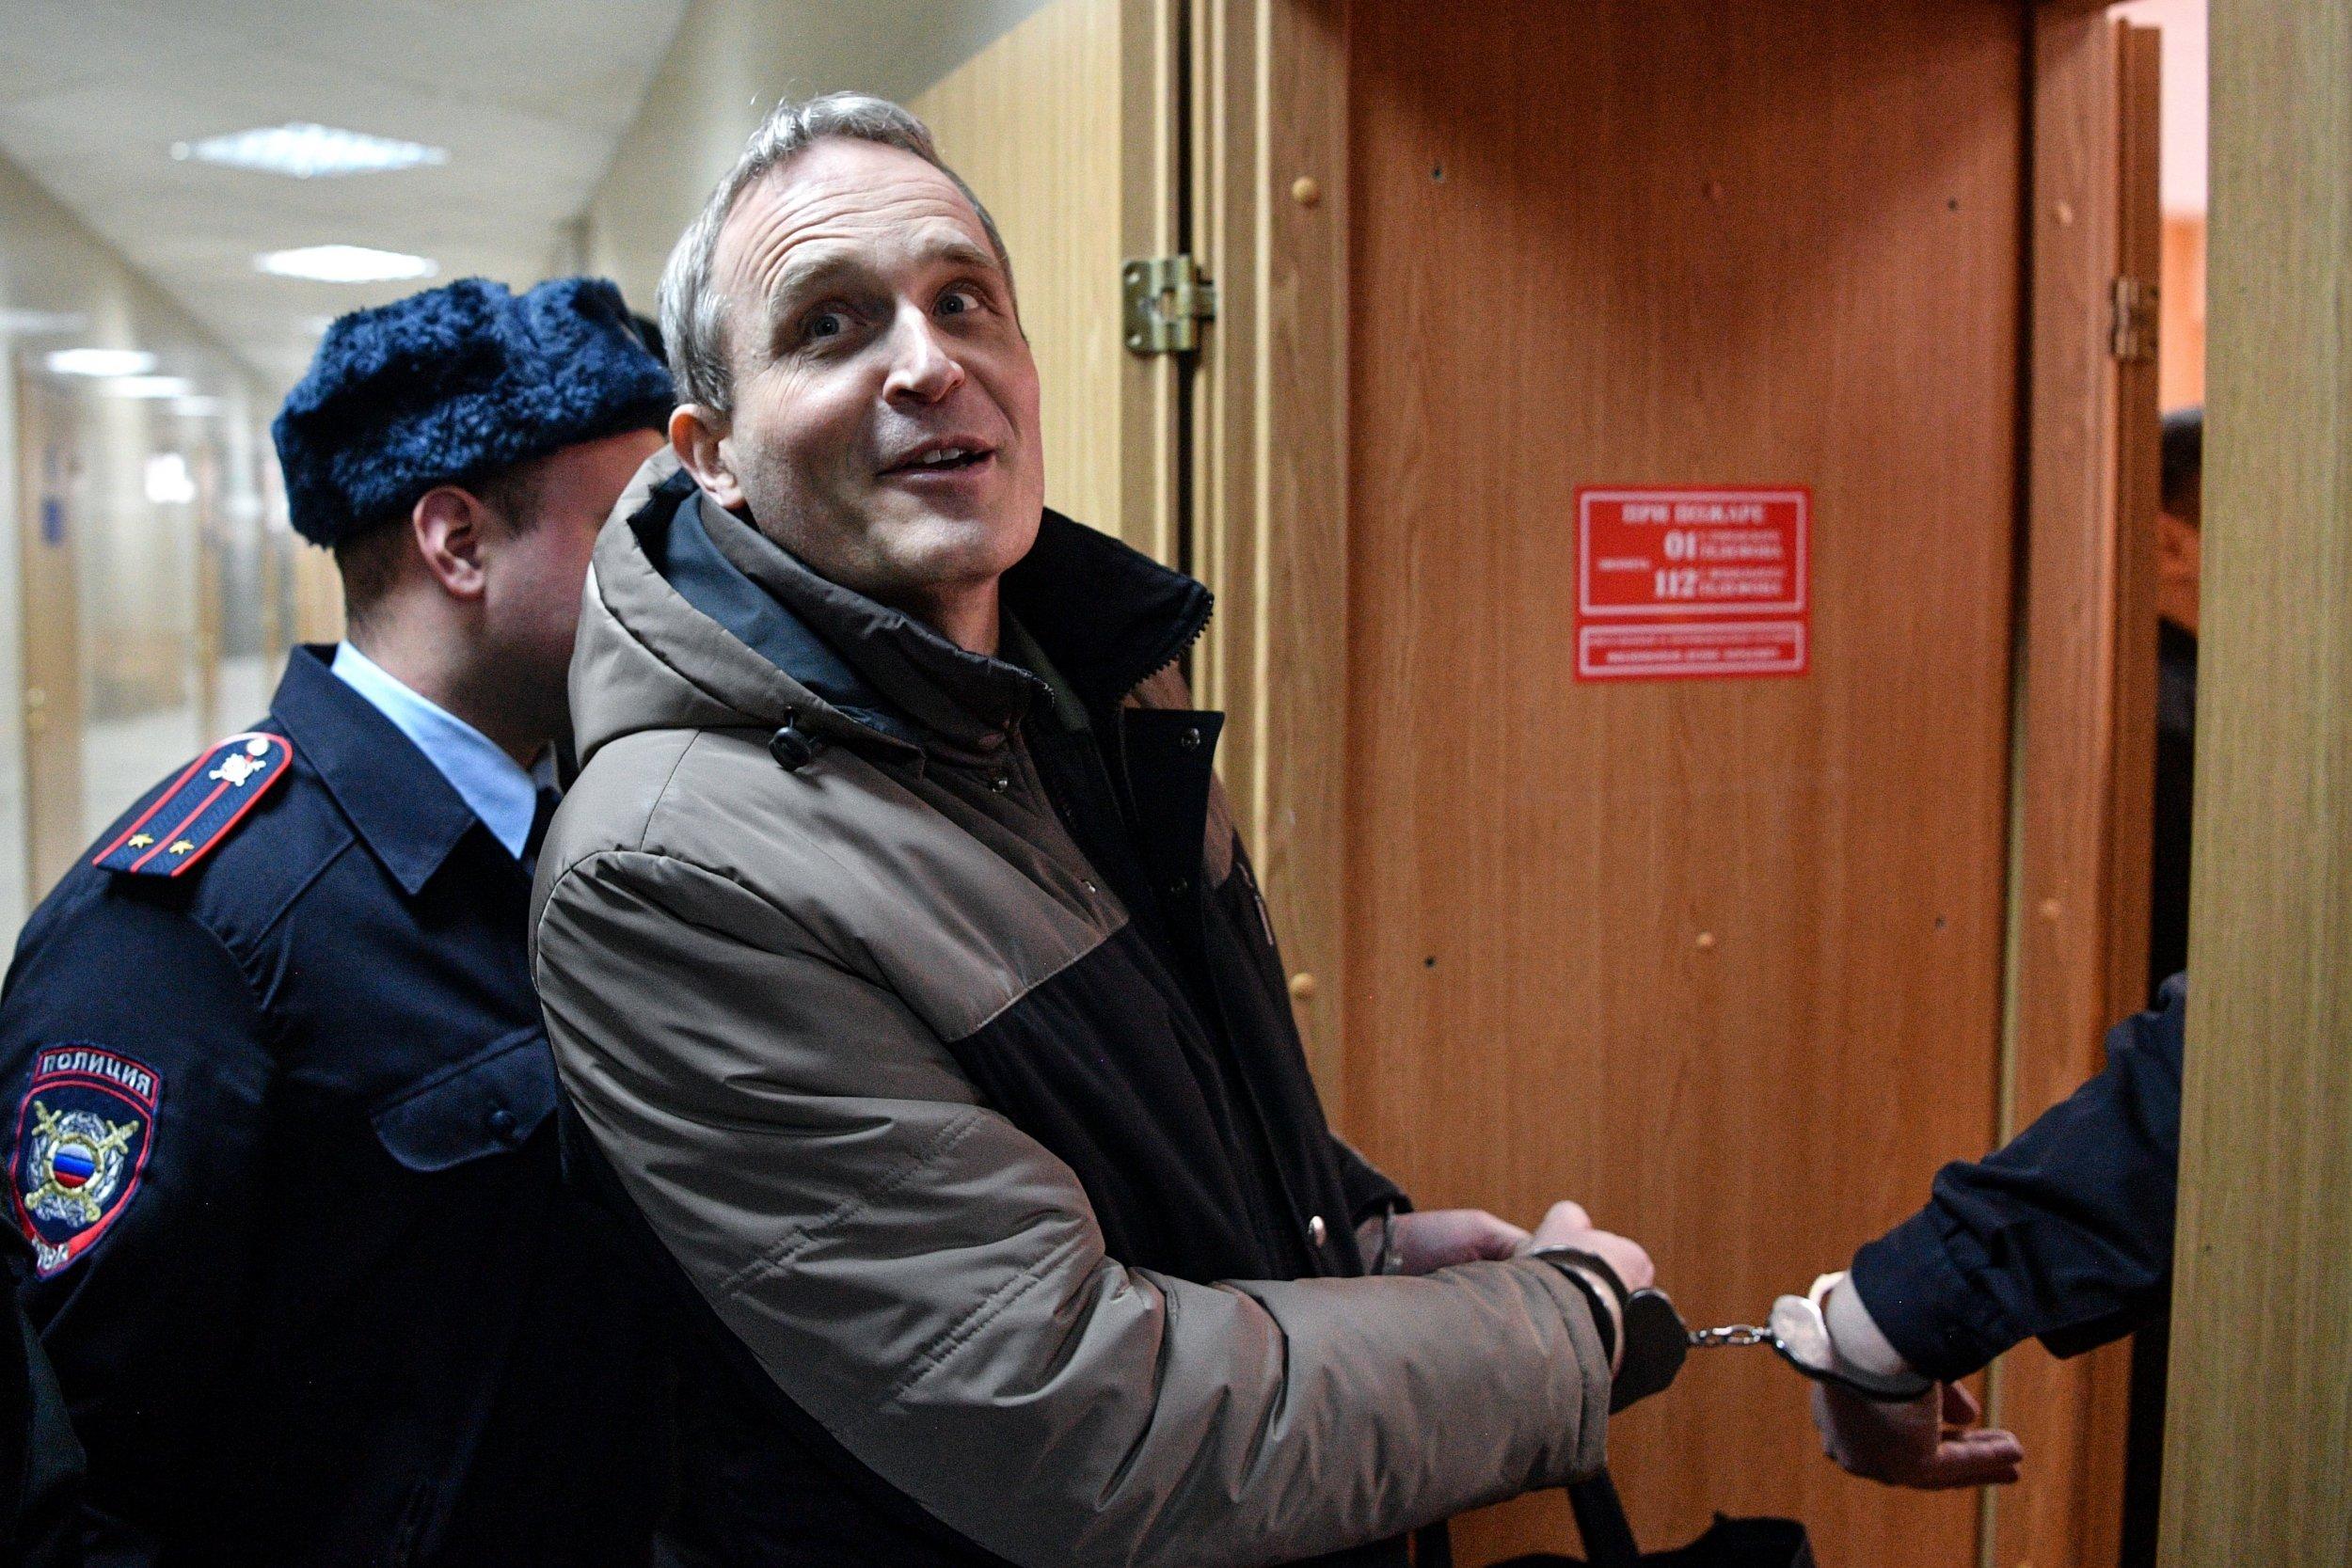 Jehovah's Witness Russia Dennis Christensen